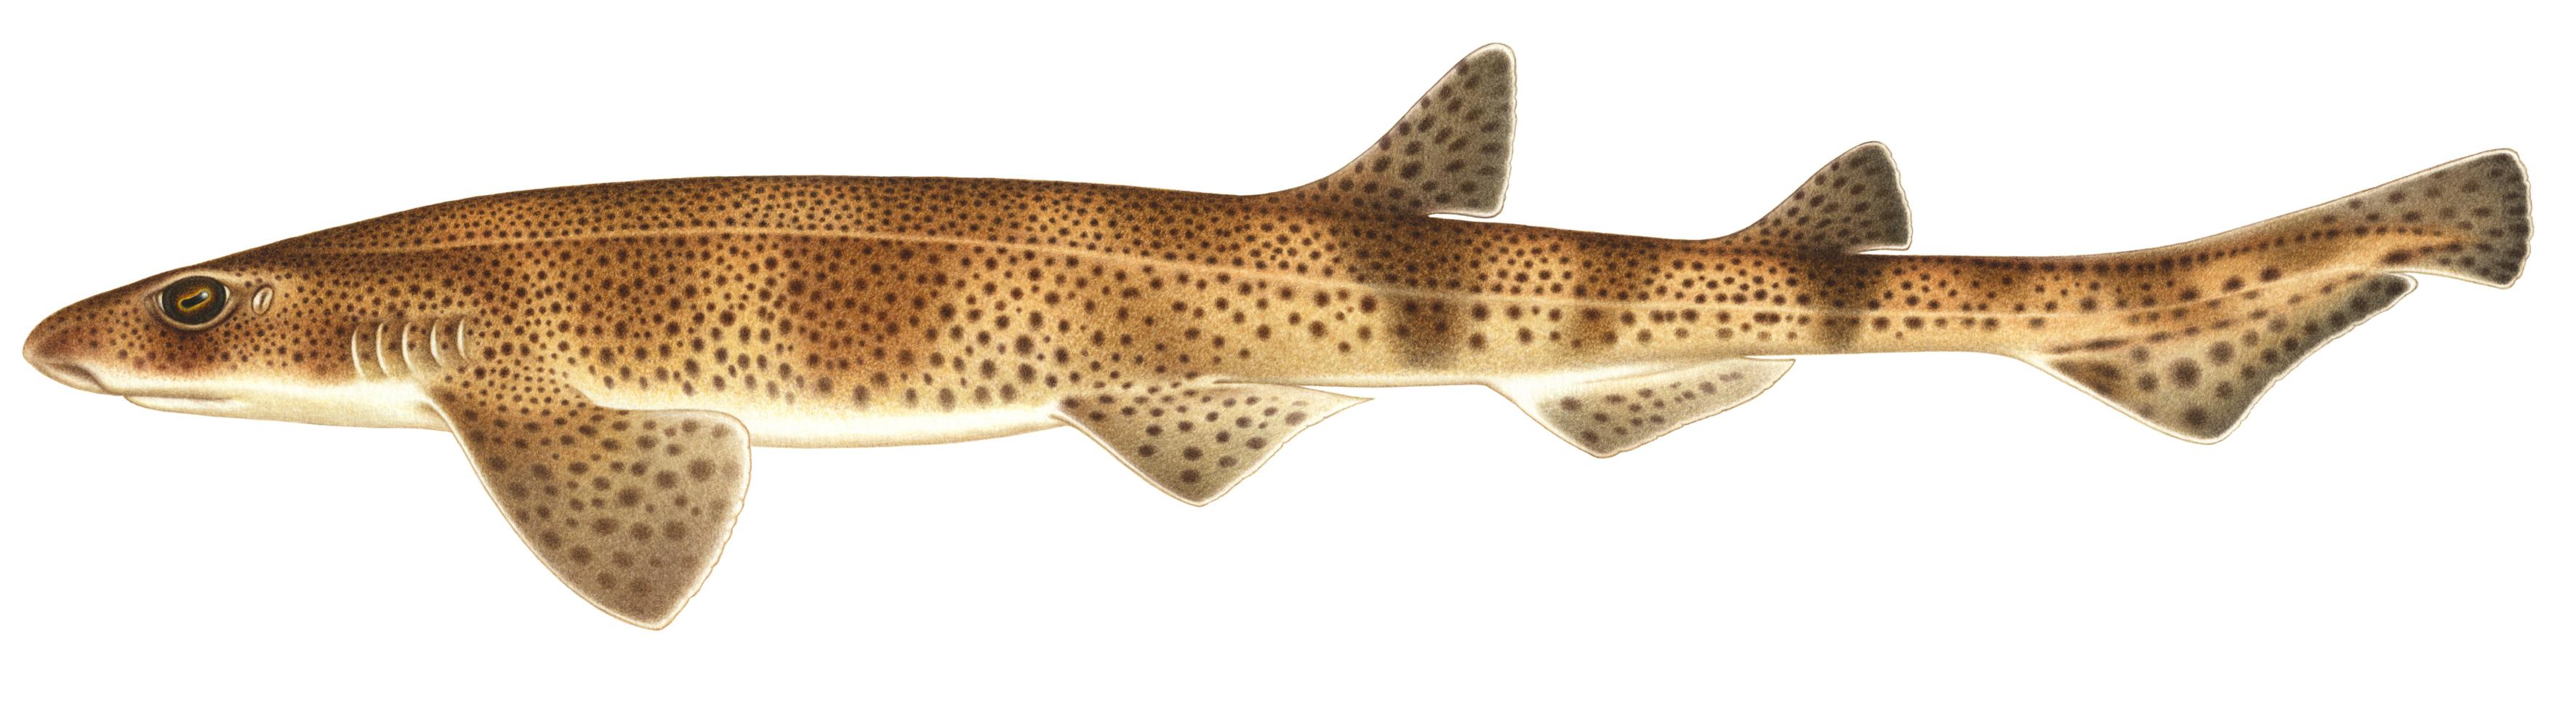 brosk-Smaflackig-rodhaj-Scyliorhinus-canicula-bild-Linda-Nyman